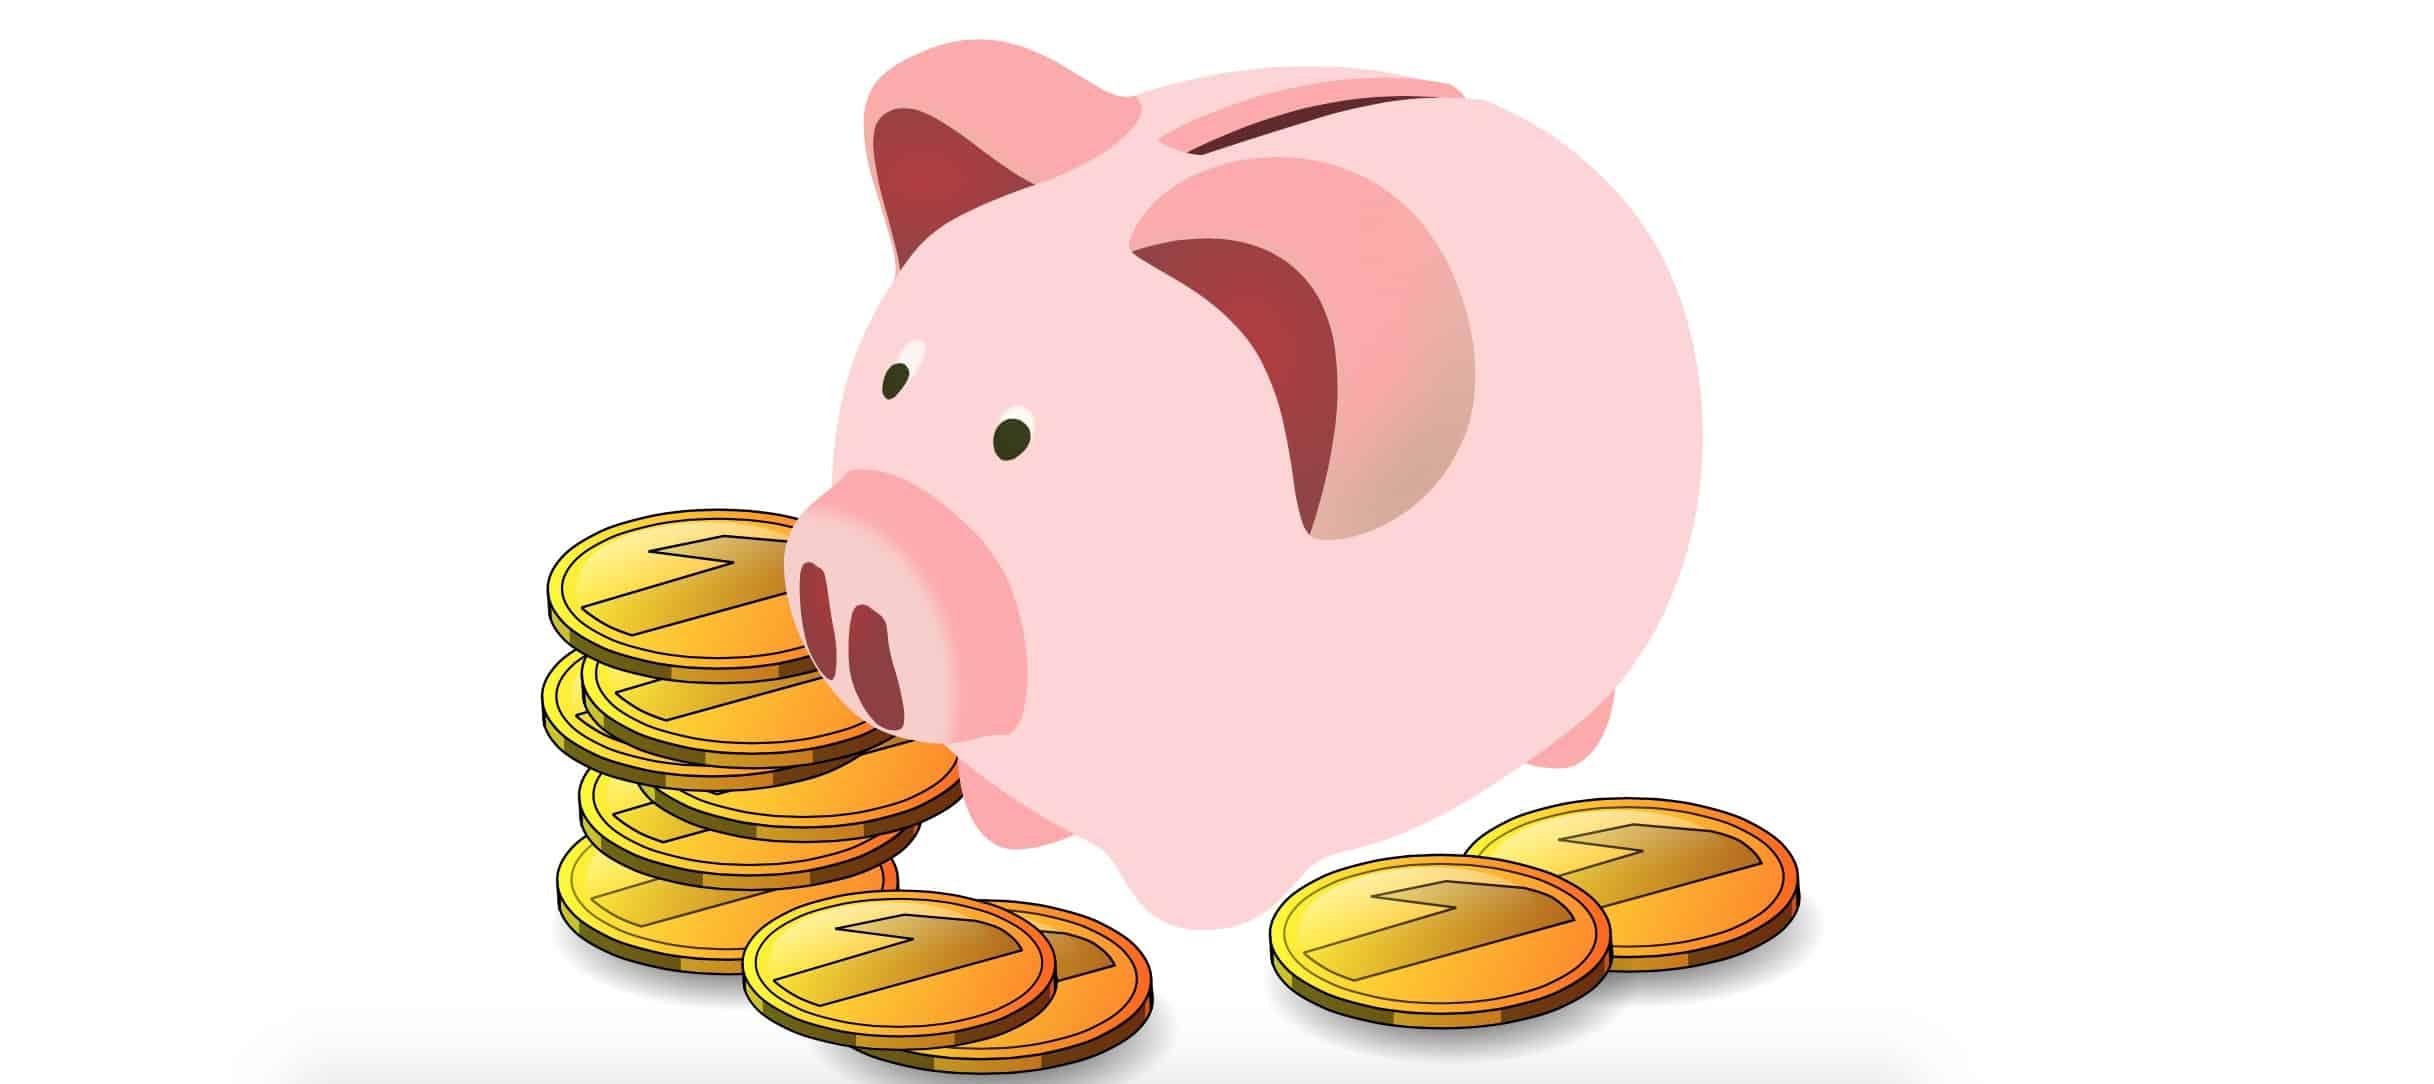 Emergency Fund vs Student Loan